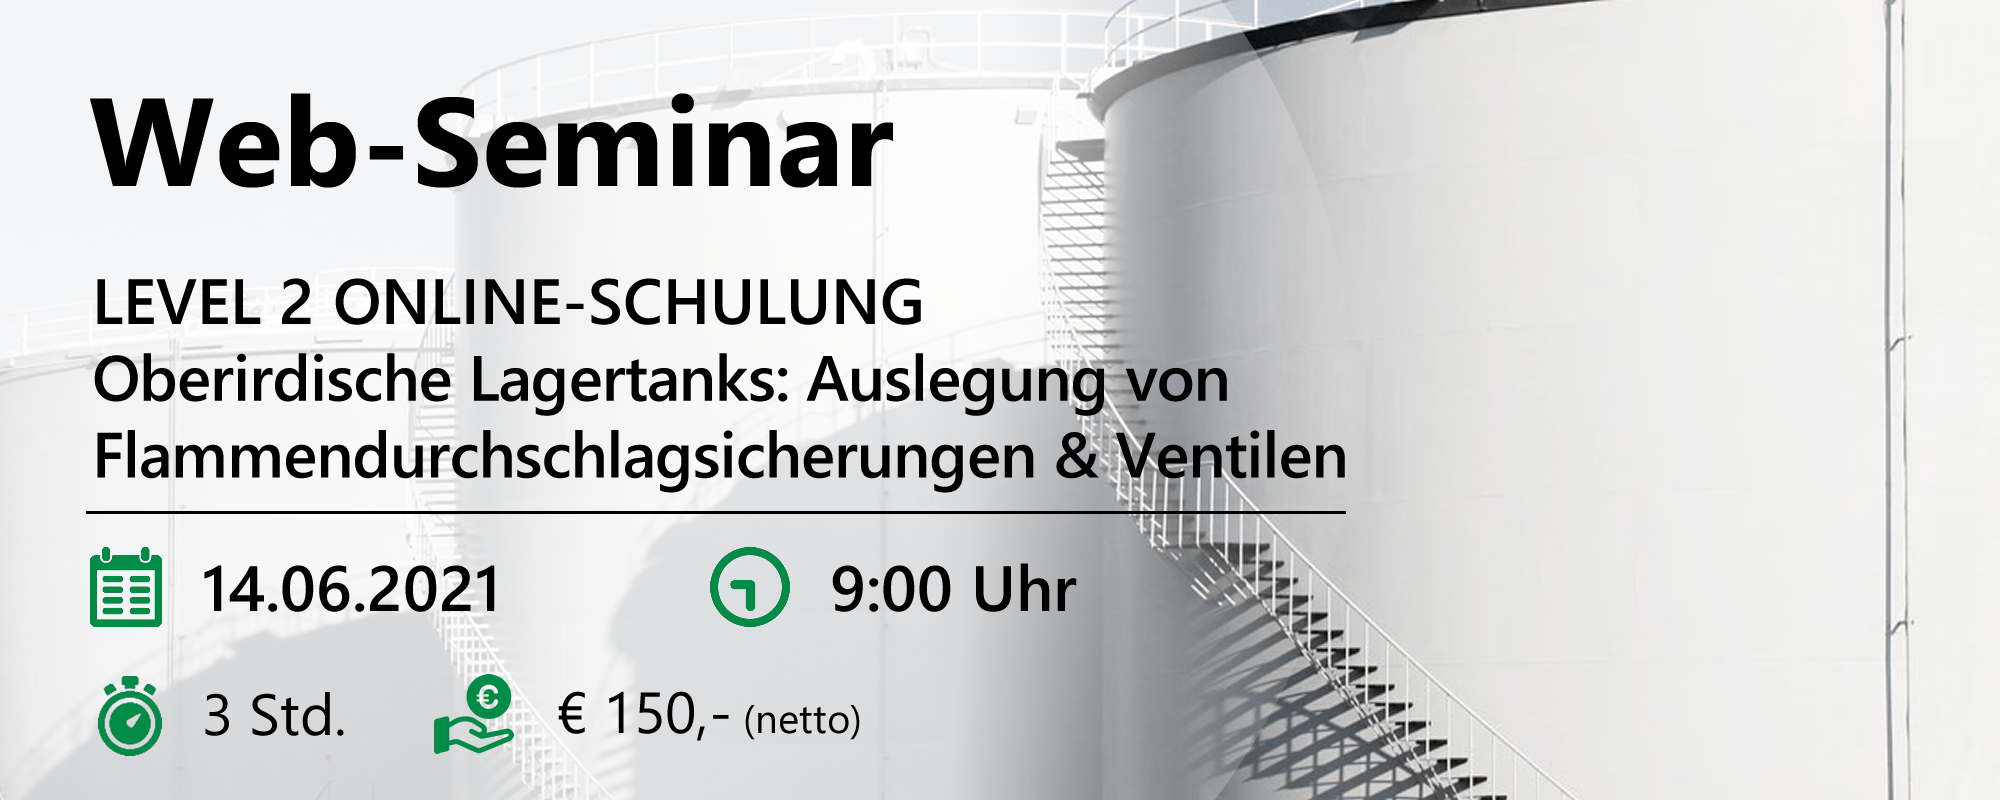 Web-Seminar am 14.06.2021